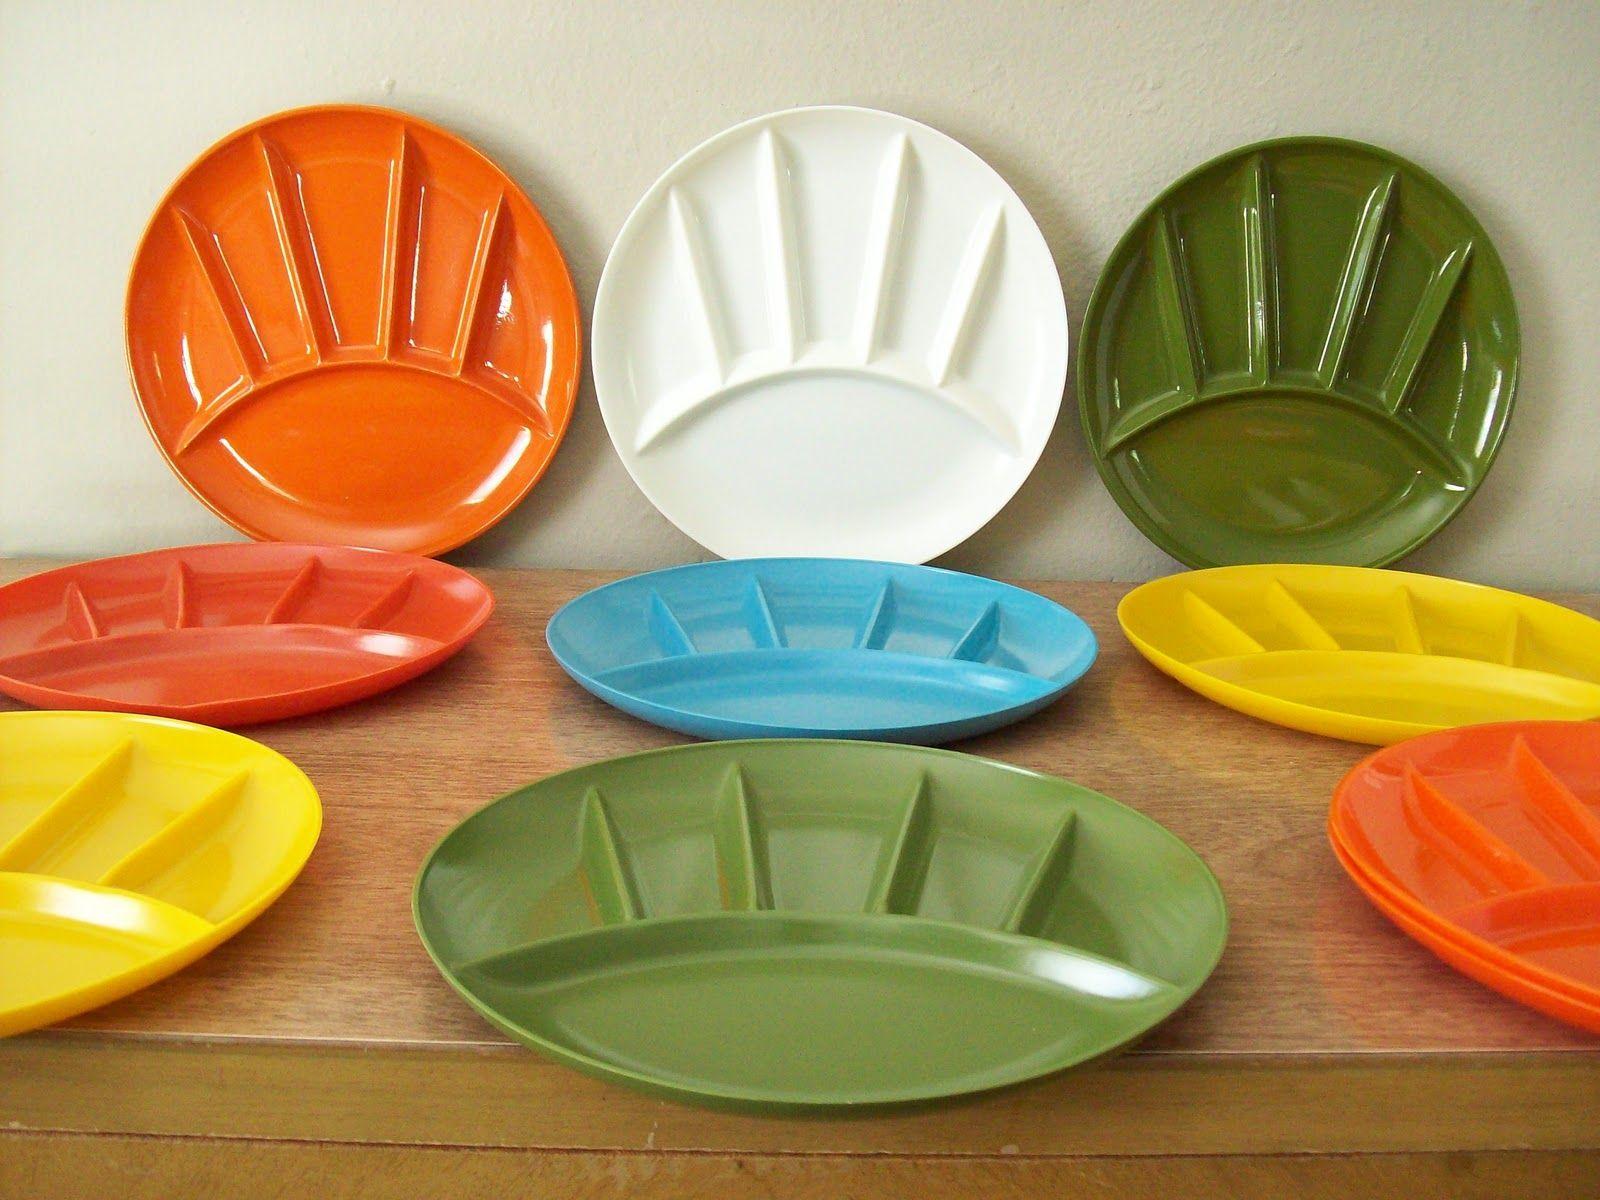 Melamine Picnic Plates In Fantastic Bright Colors